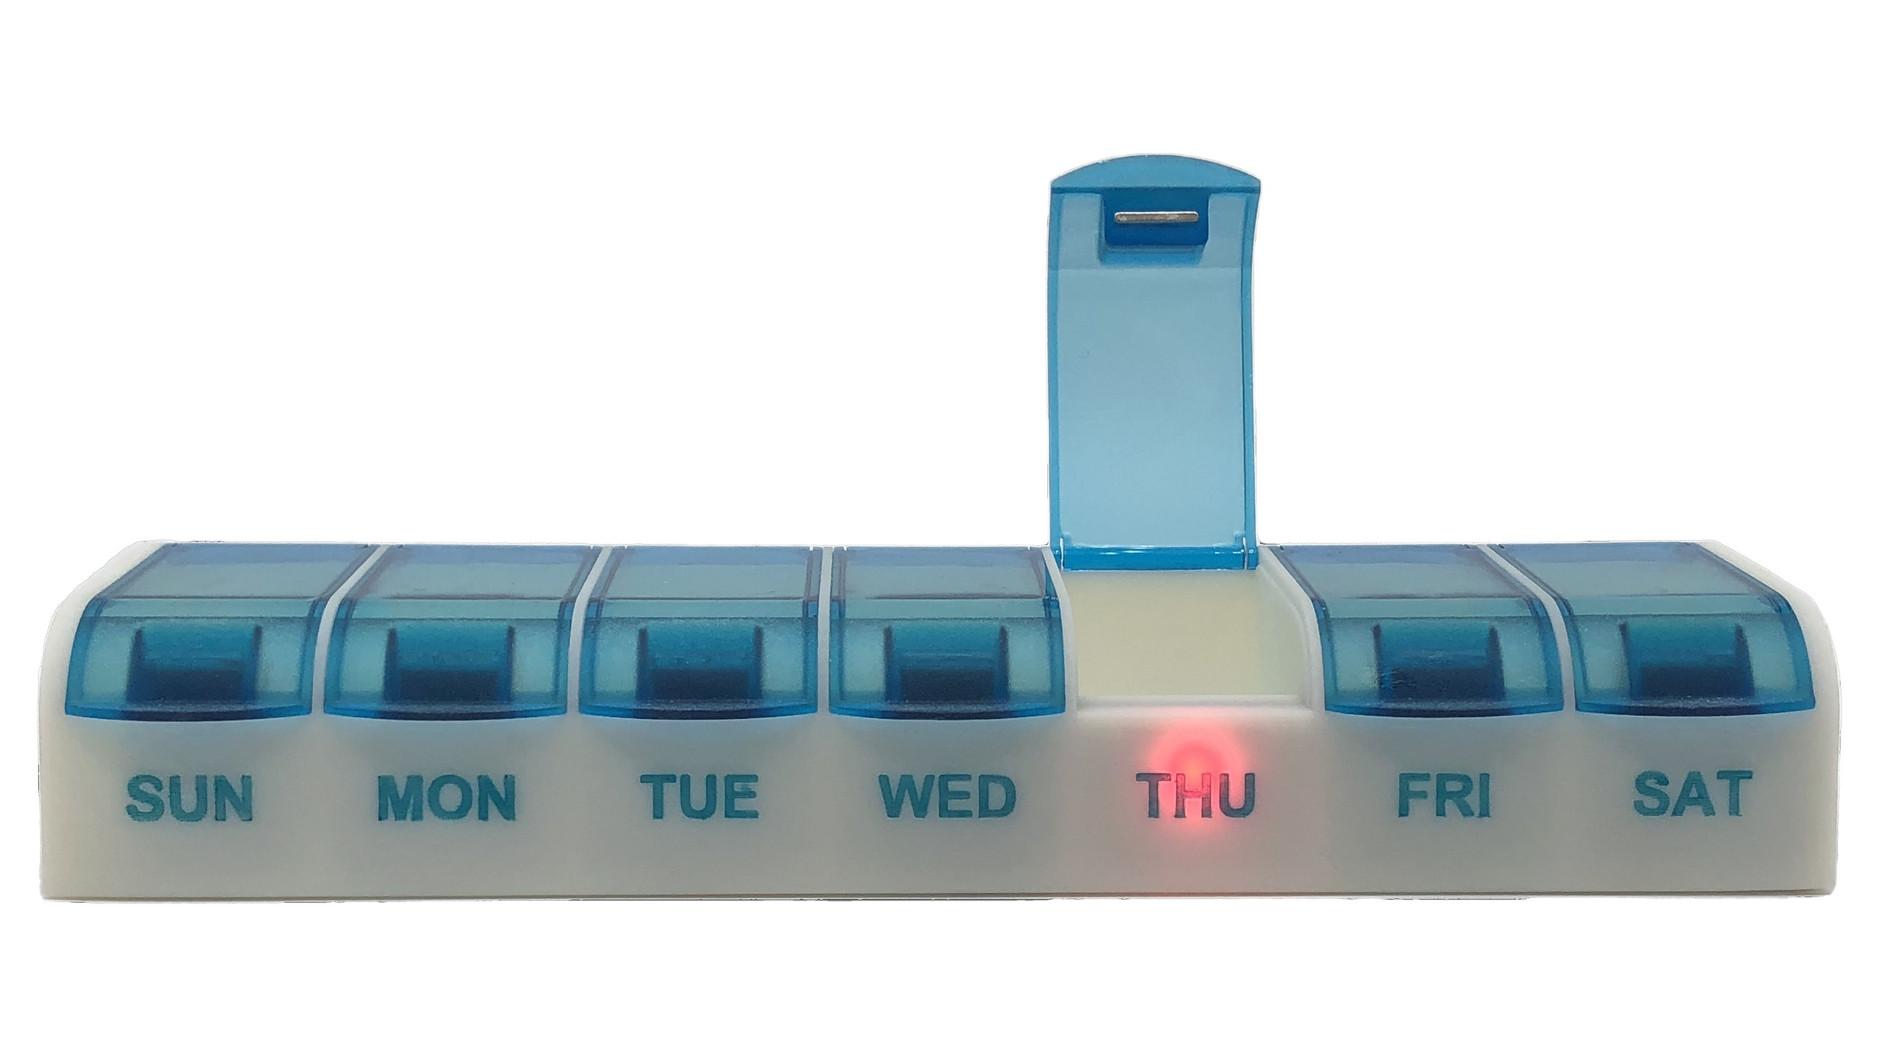 uSev weekly pillbox